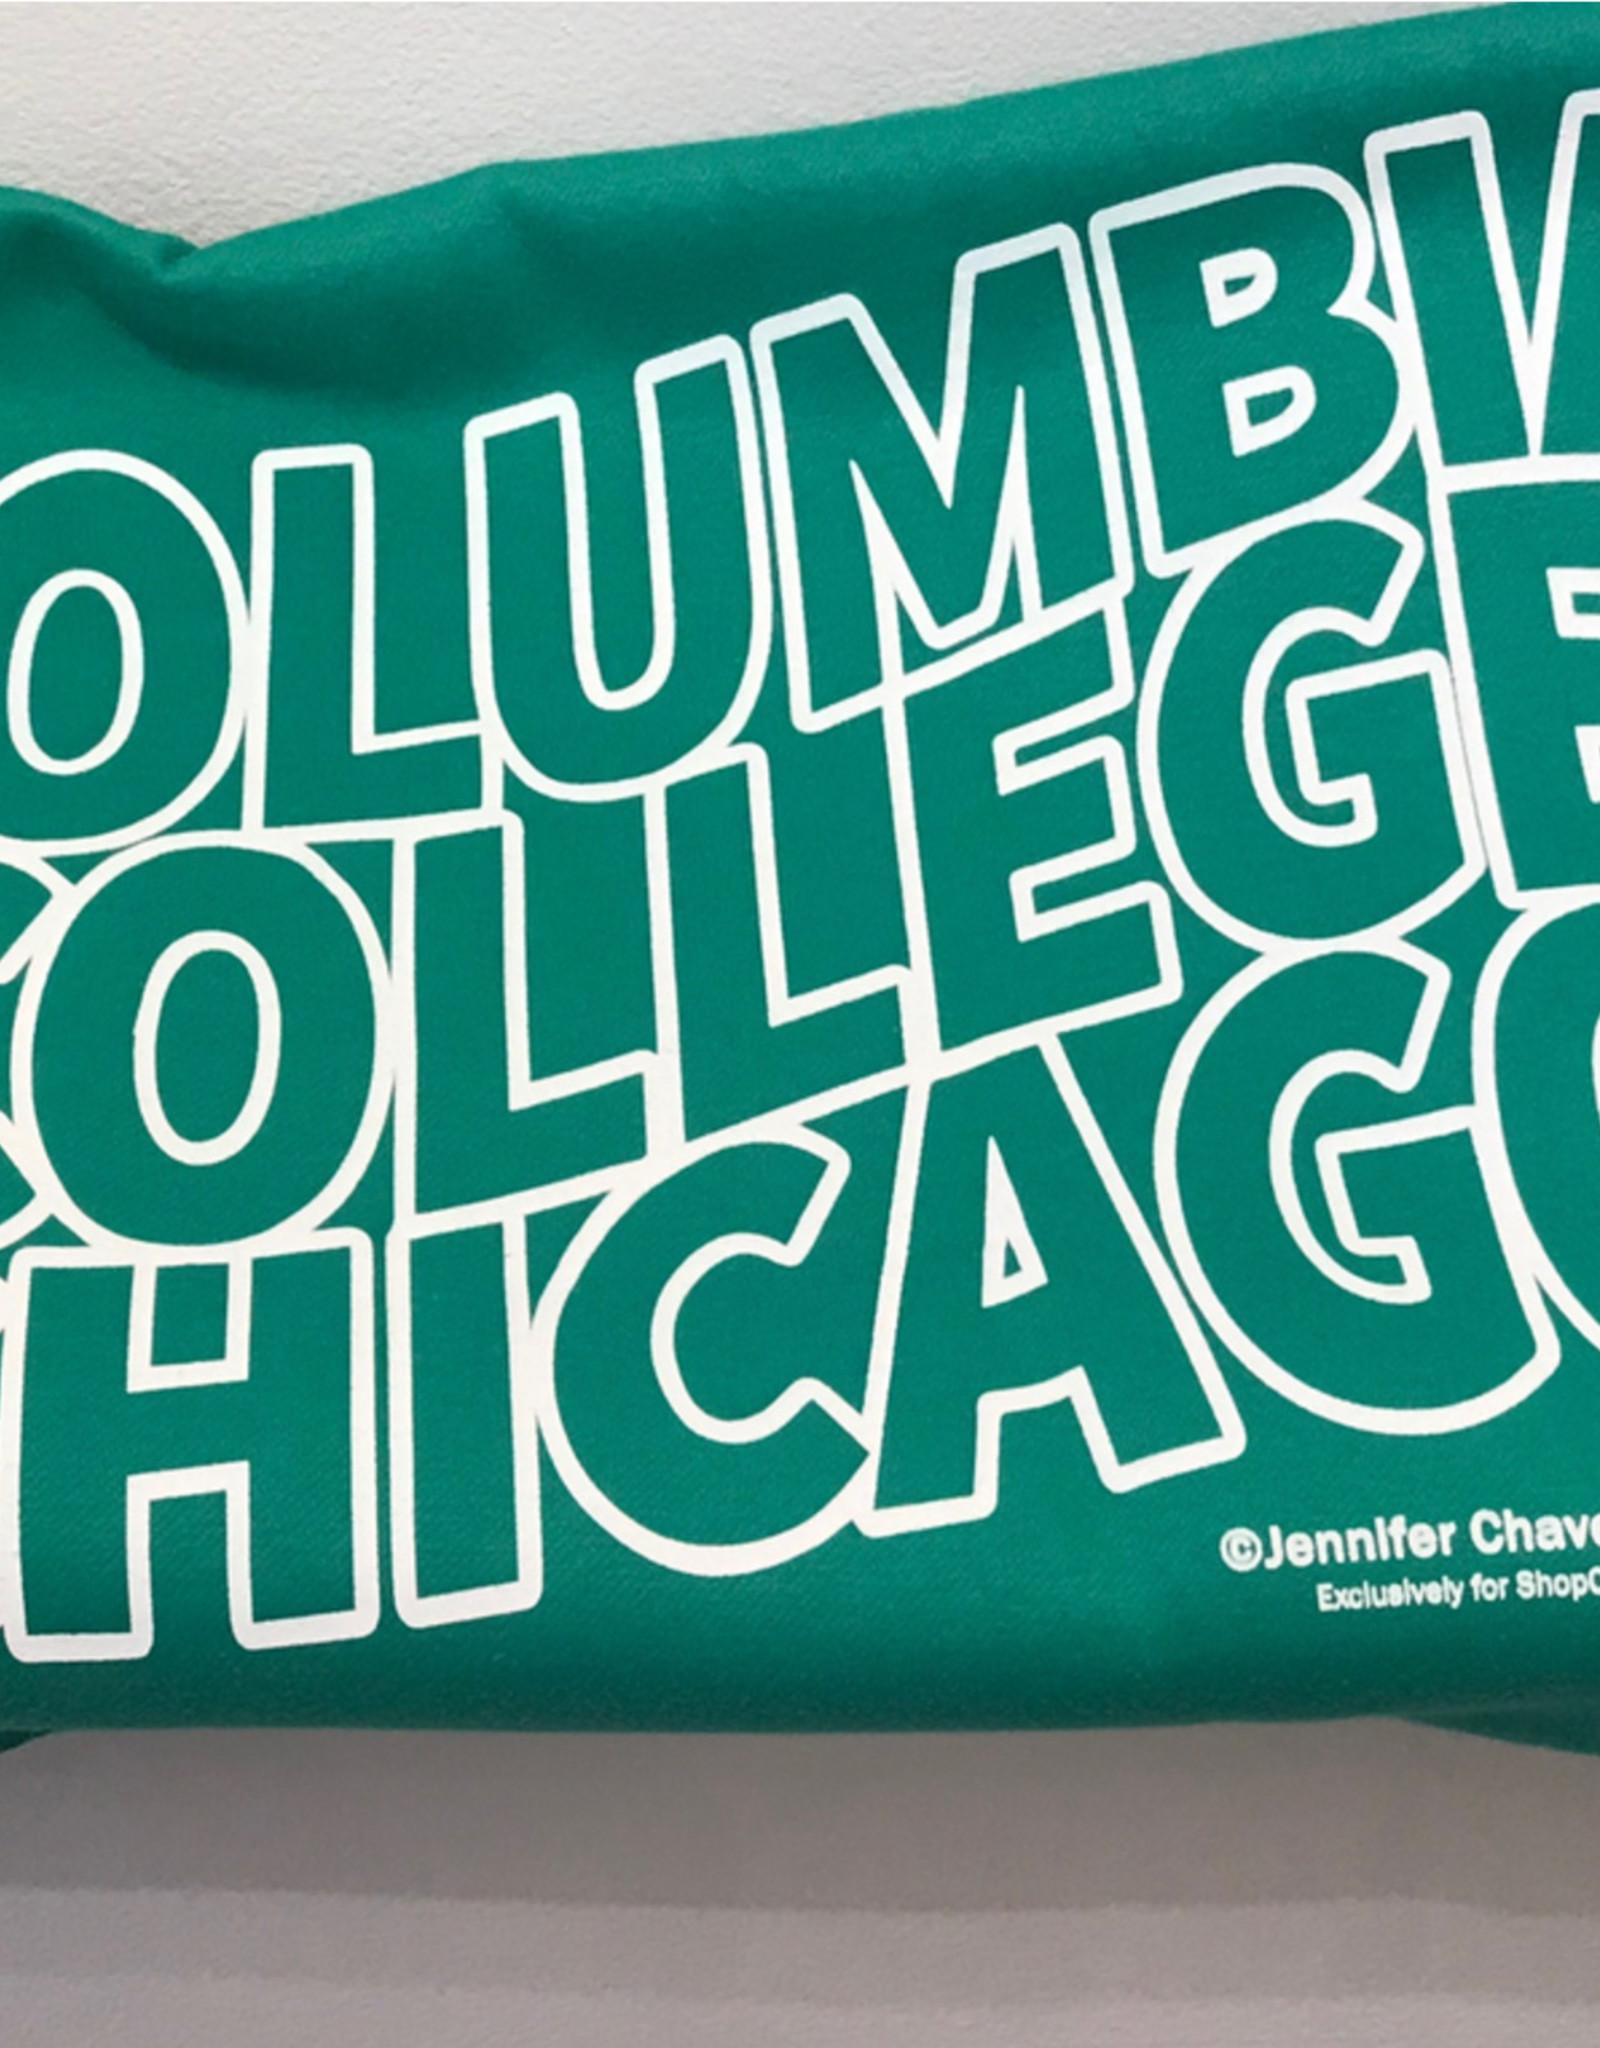 Buy Columbia, By Columbia Columbia College Chicago Sweatshirt Blanket in Kelly - Buy Columbia, By Columbia